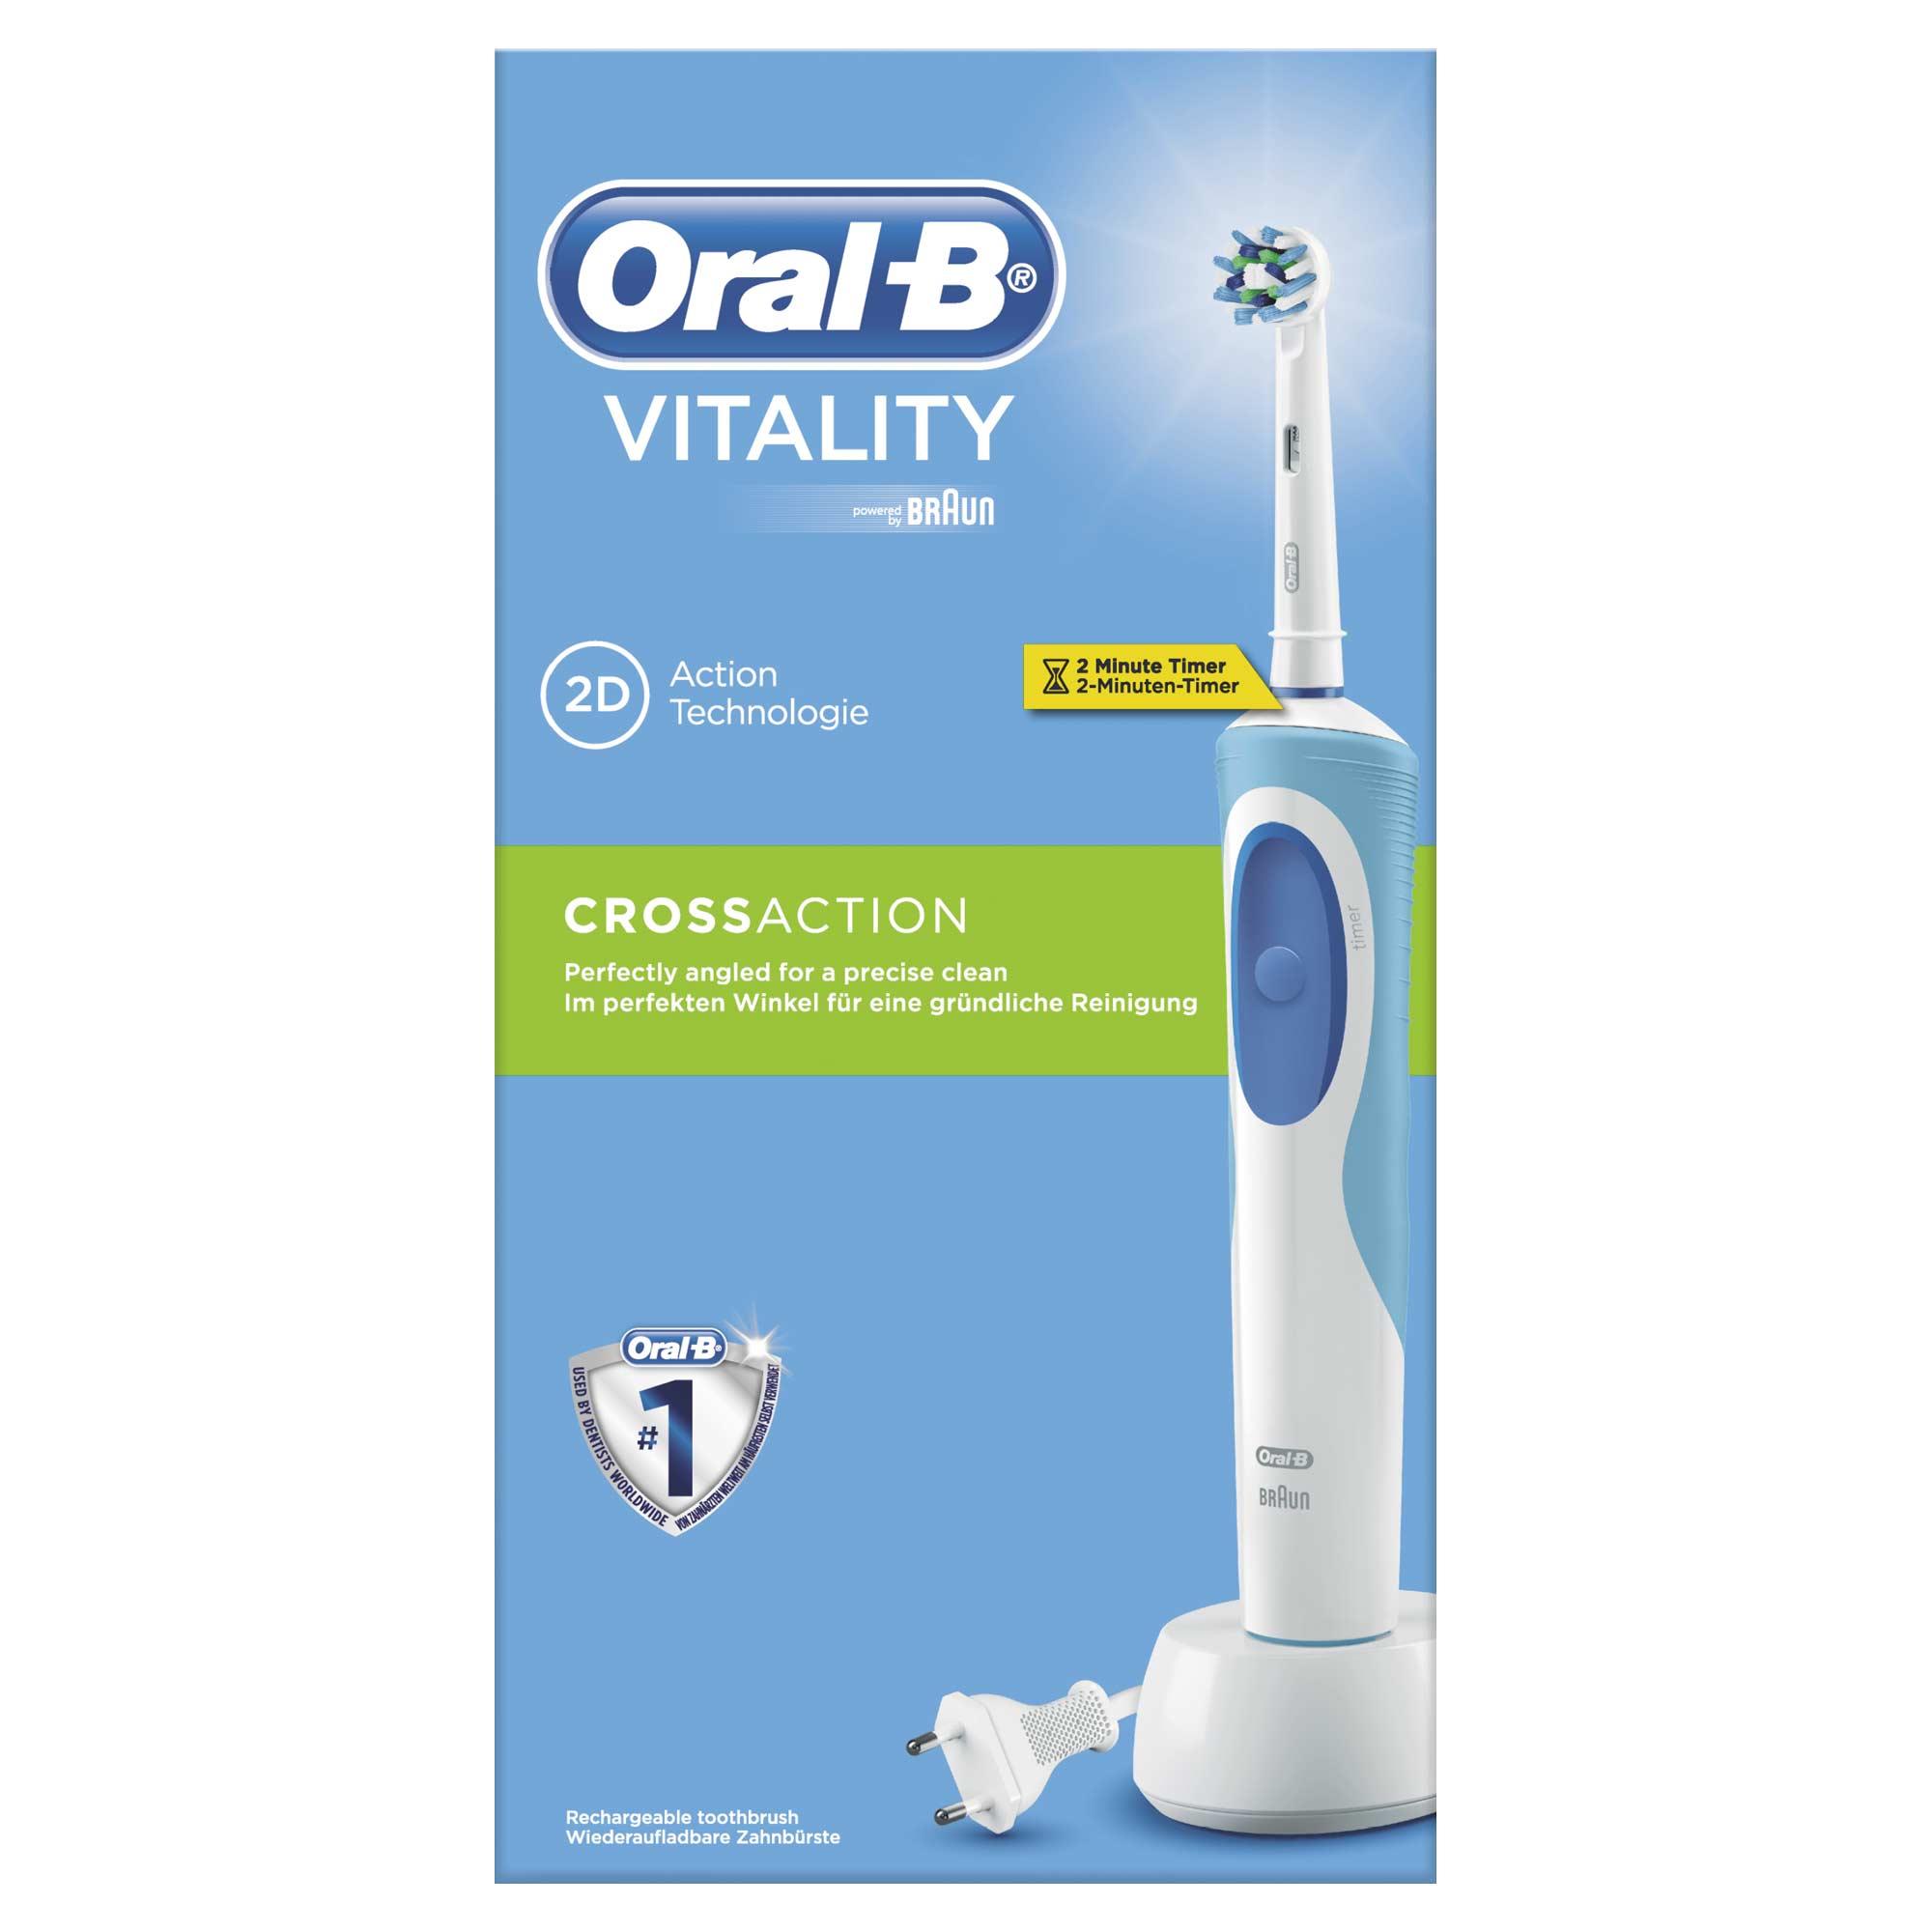 Oral B Vitality Pro Timer Cross Action 2D Ηλεκτρική Οδοντόβουρτσα, 1 τεμάχιο & 1 Κεφαλή Cross Action